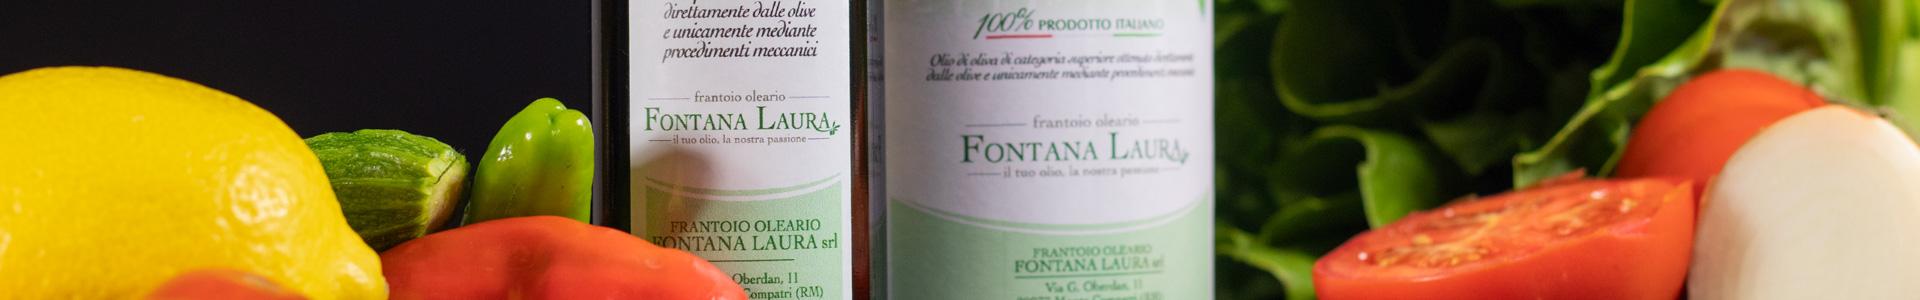 Frantoio-Fontana-Laura_Shop-Prodotti-2-web1